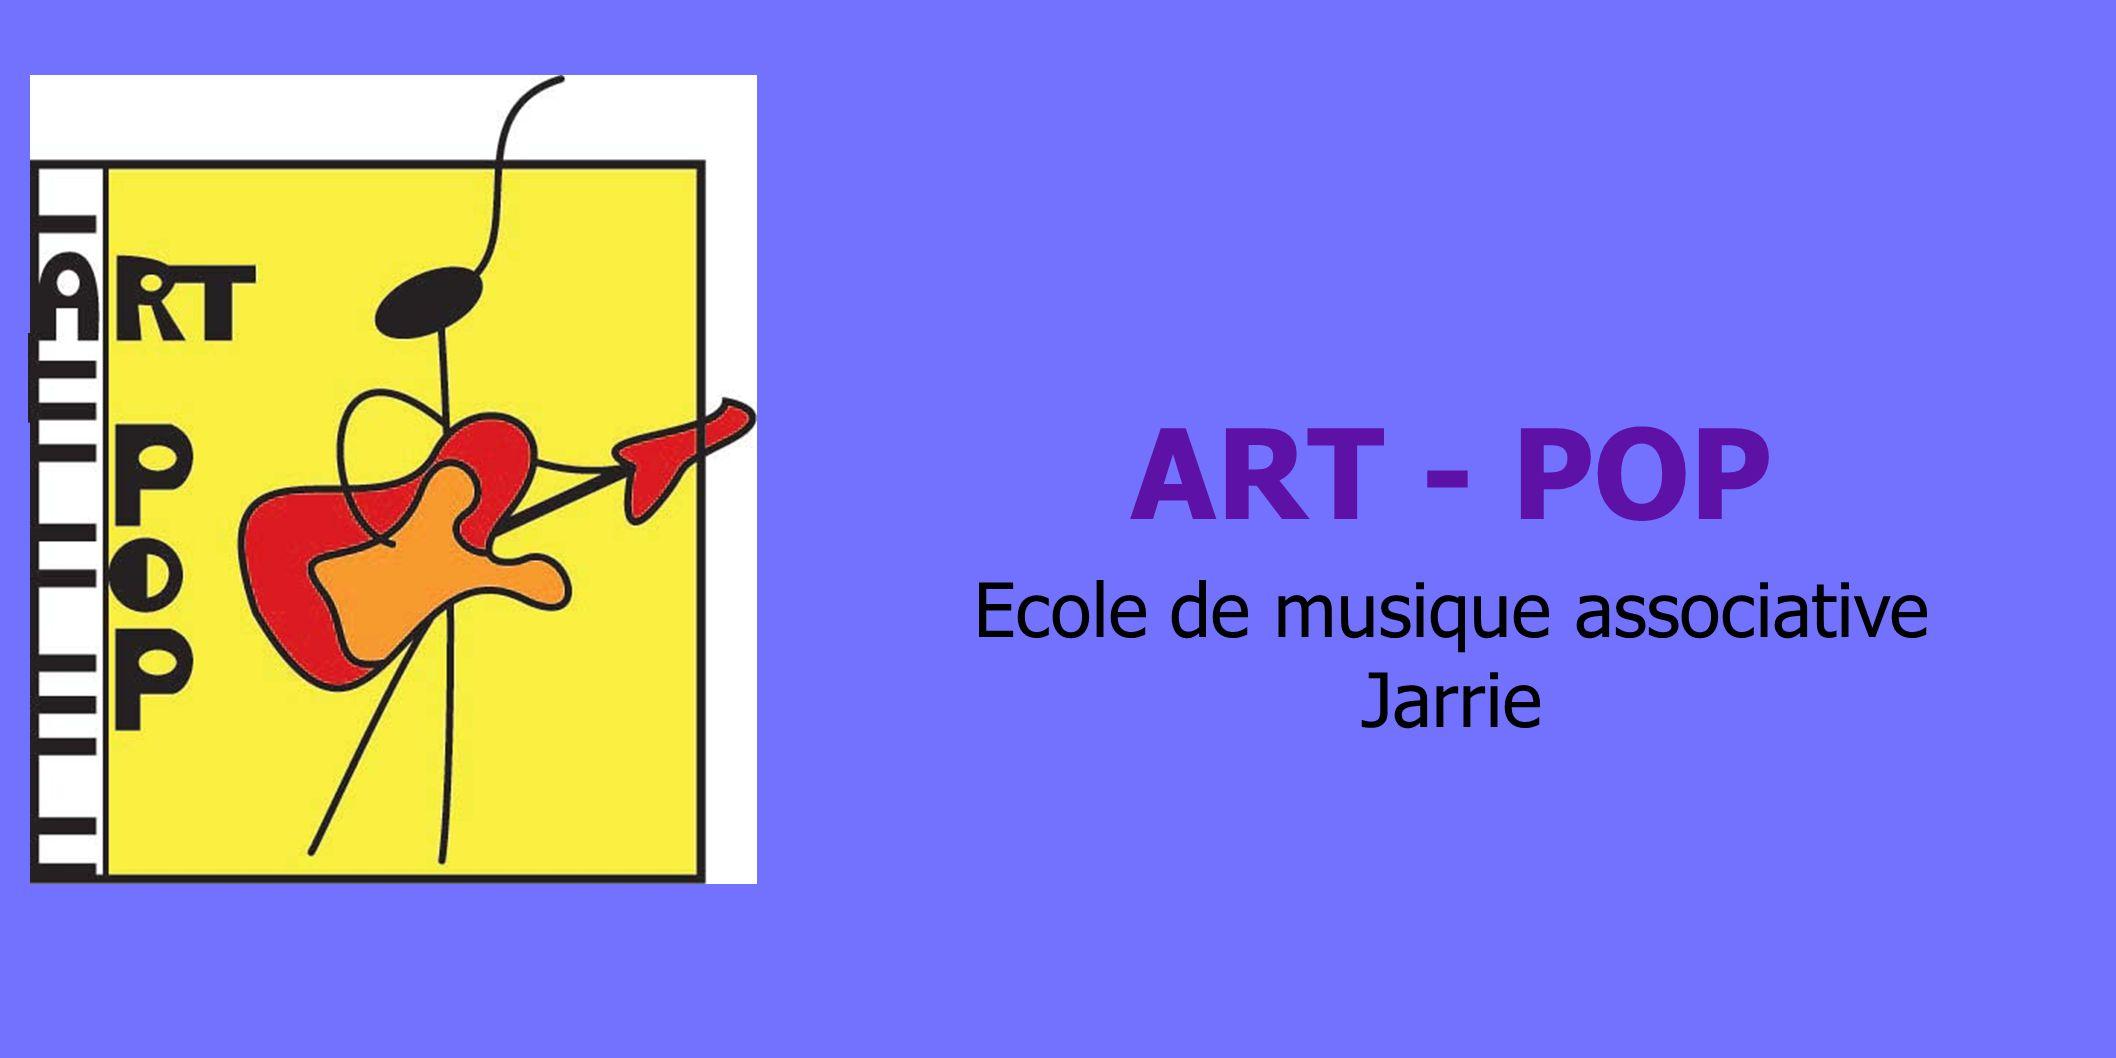 Ecole de musique associative Jarrie